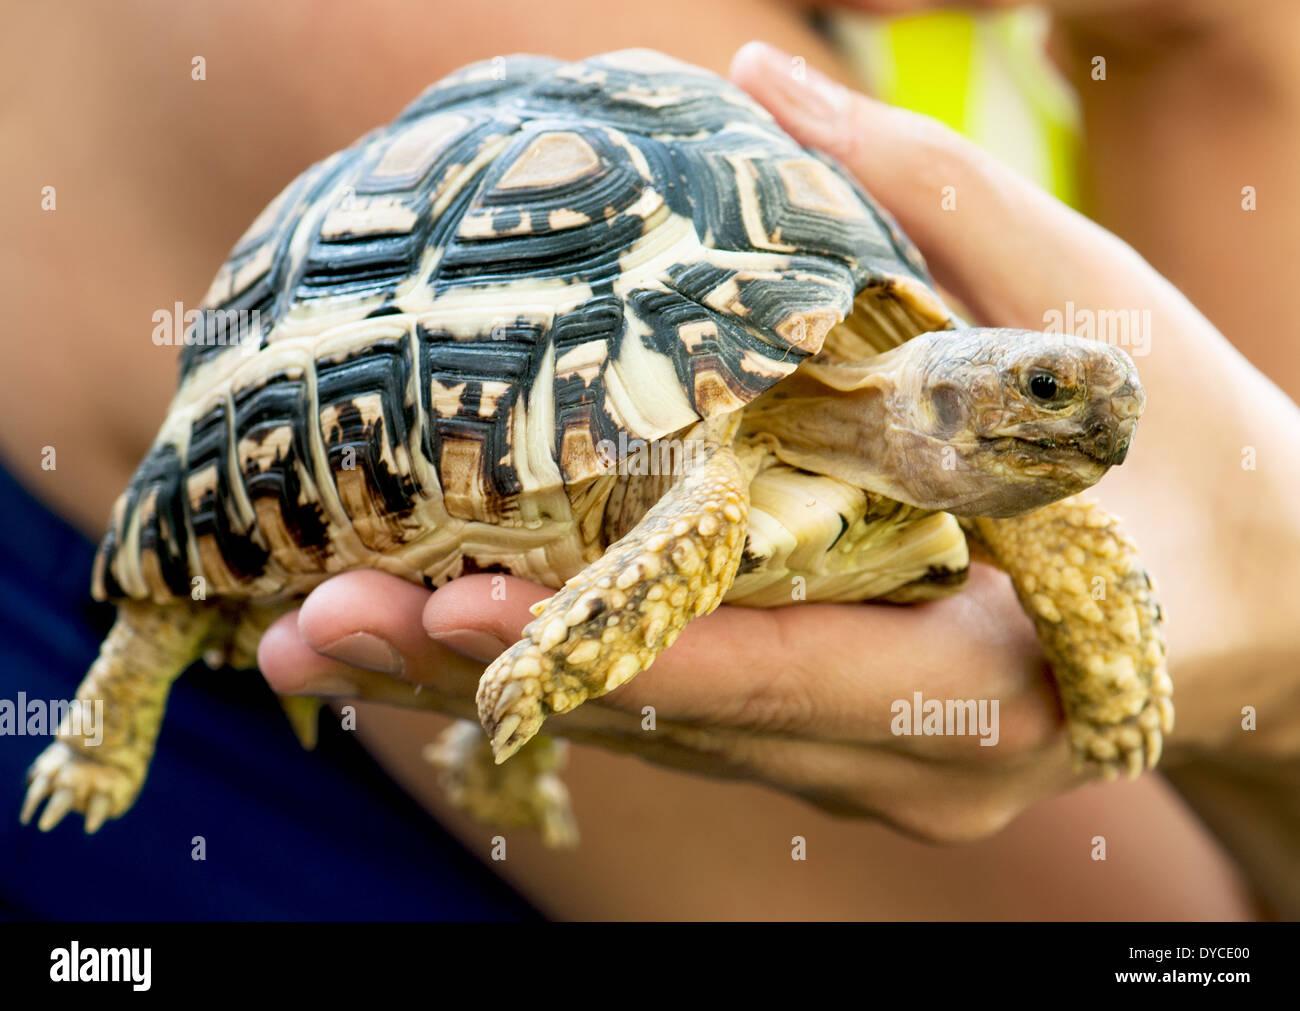 Beautiful turtle (Geochelone pardalis) in a woman's hand. - Stock Image